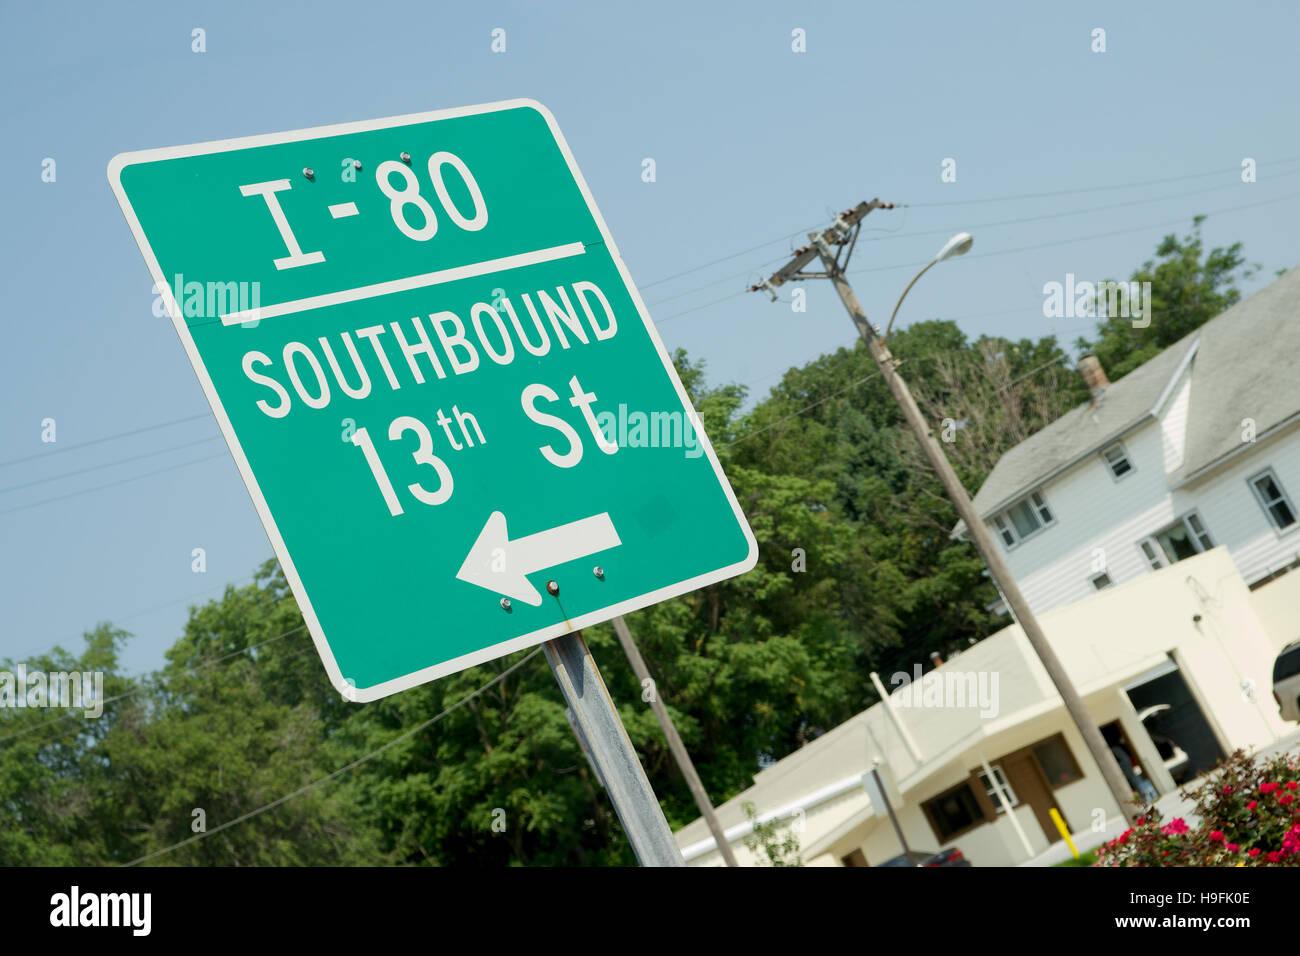 Road sign for I-80 in Omaha, Nebraska, USA - Stock Image